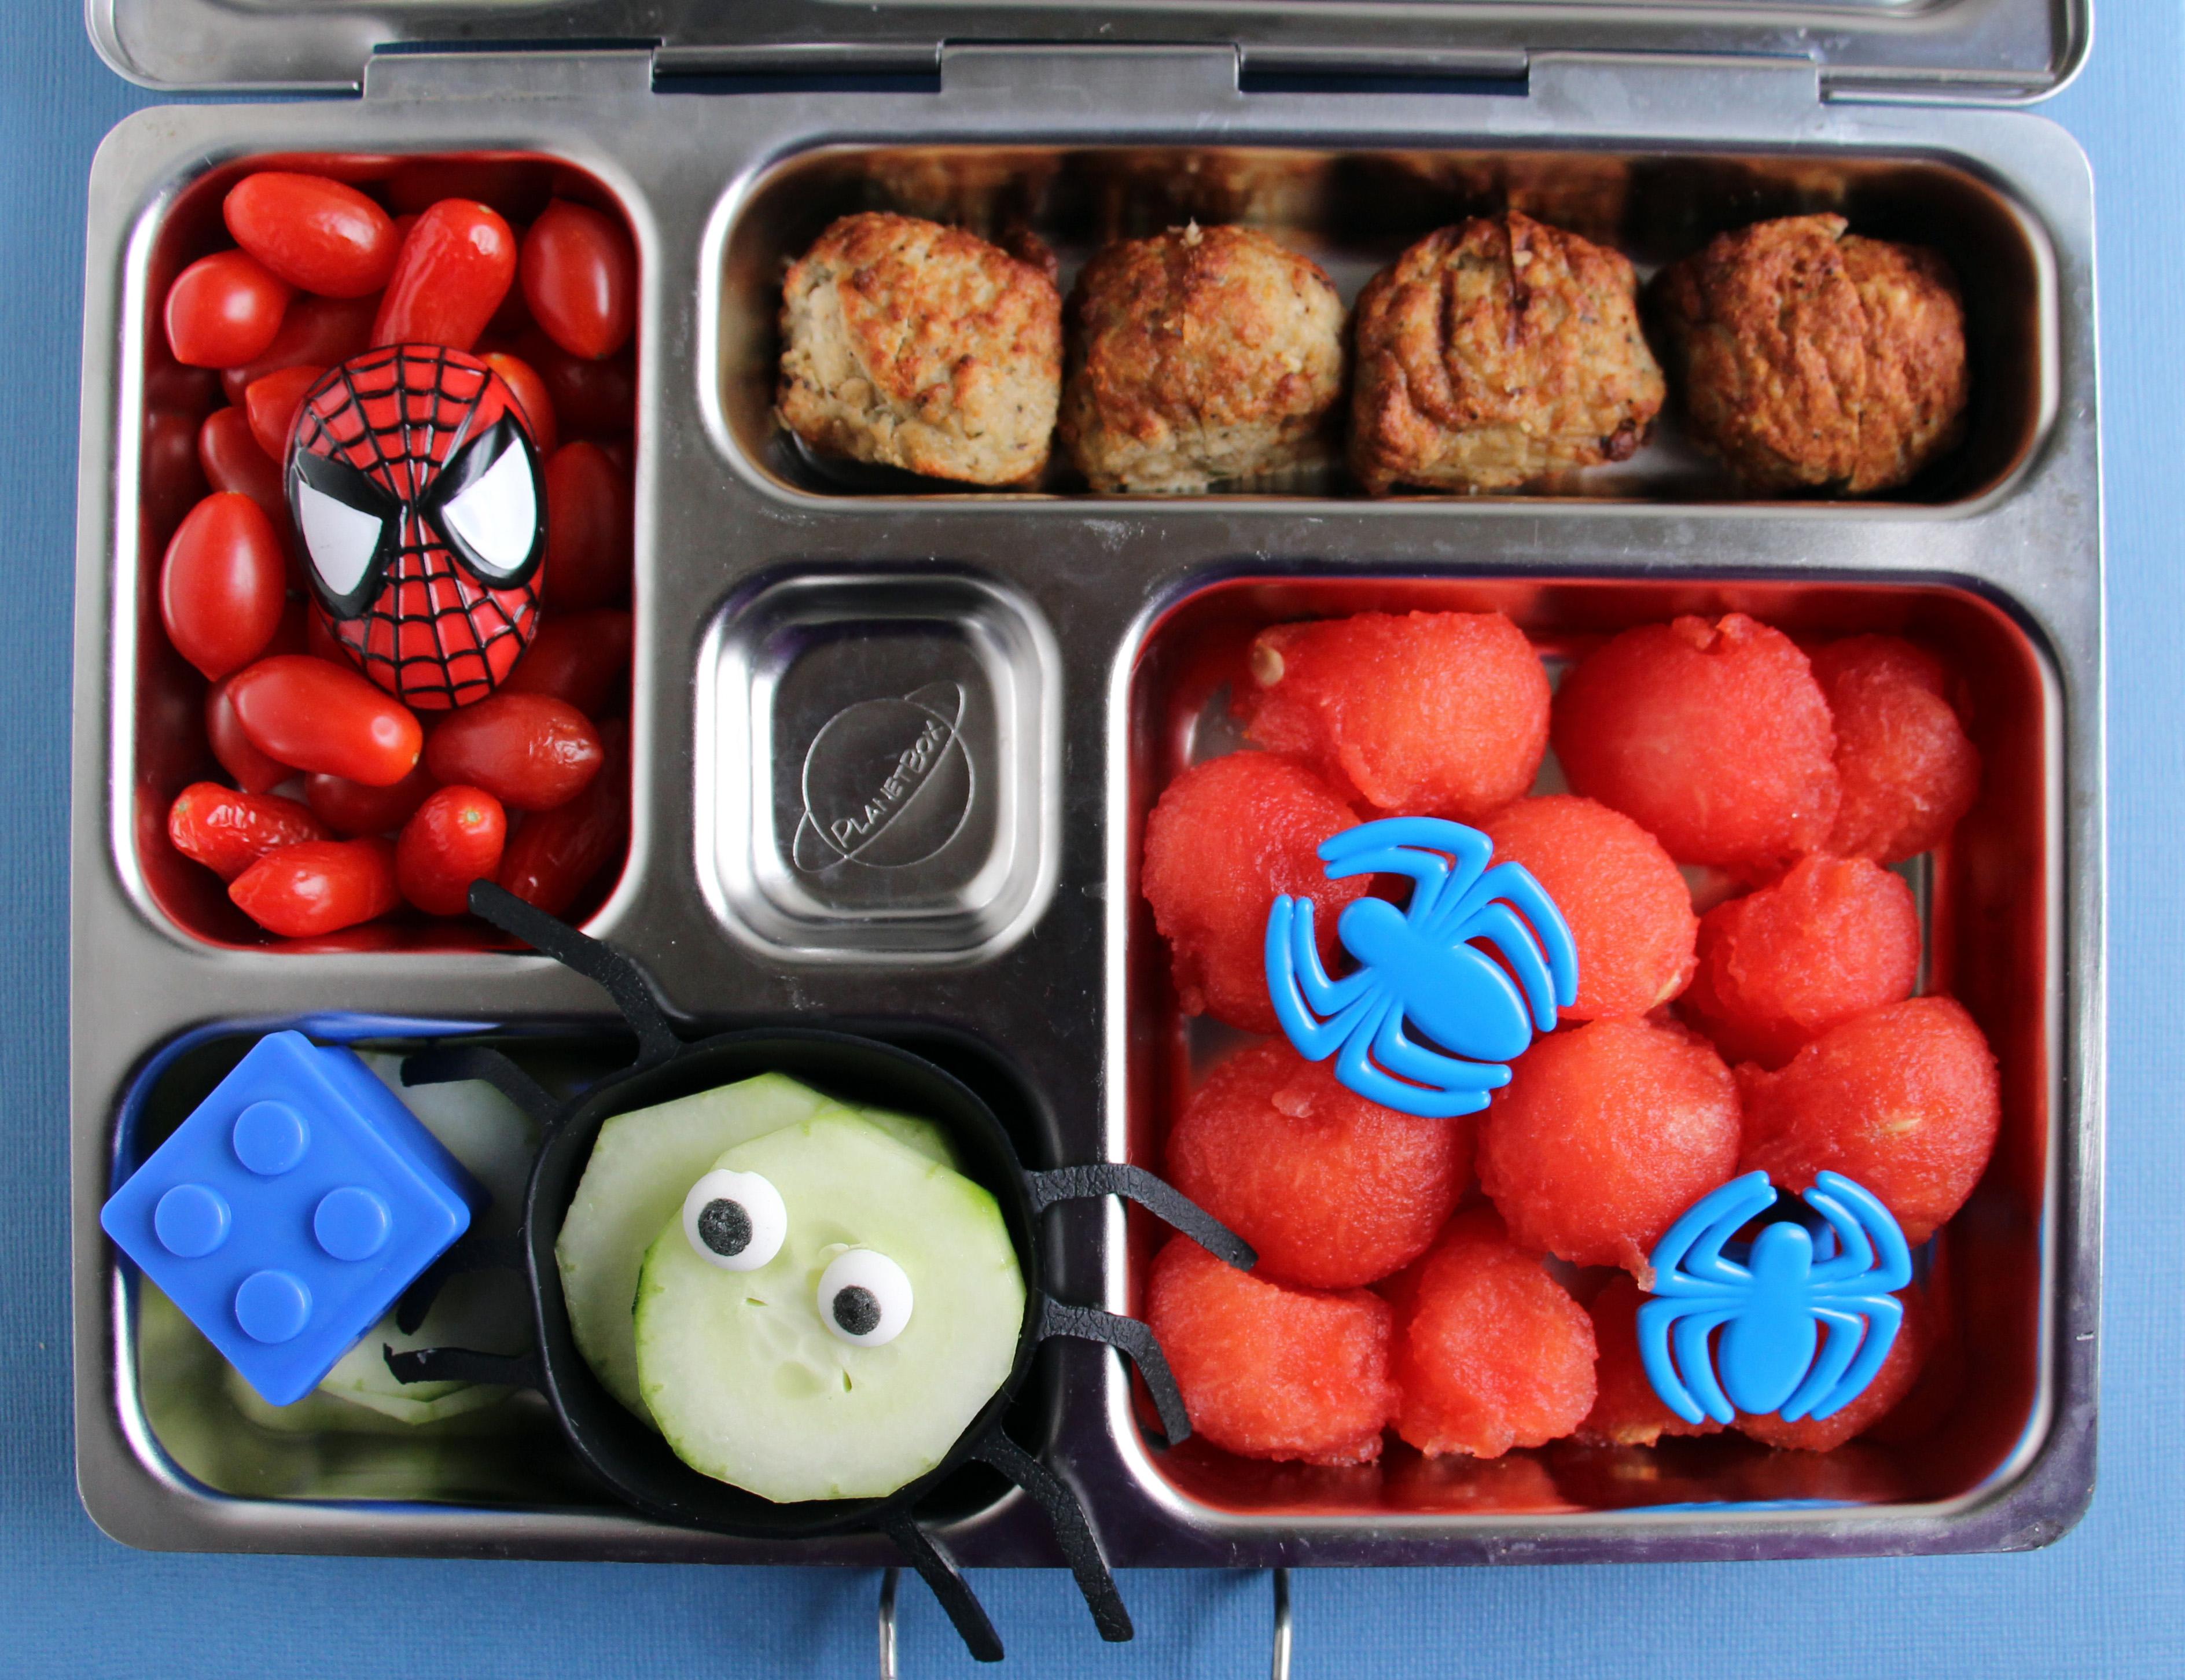 & Preschooler Spiderman Planetbox Lunch Aboutintivar.Com